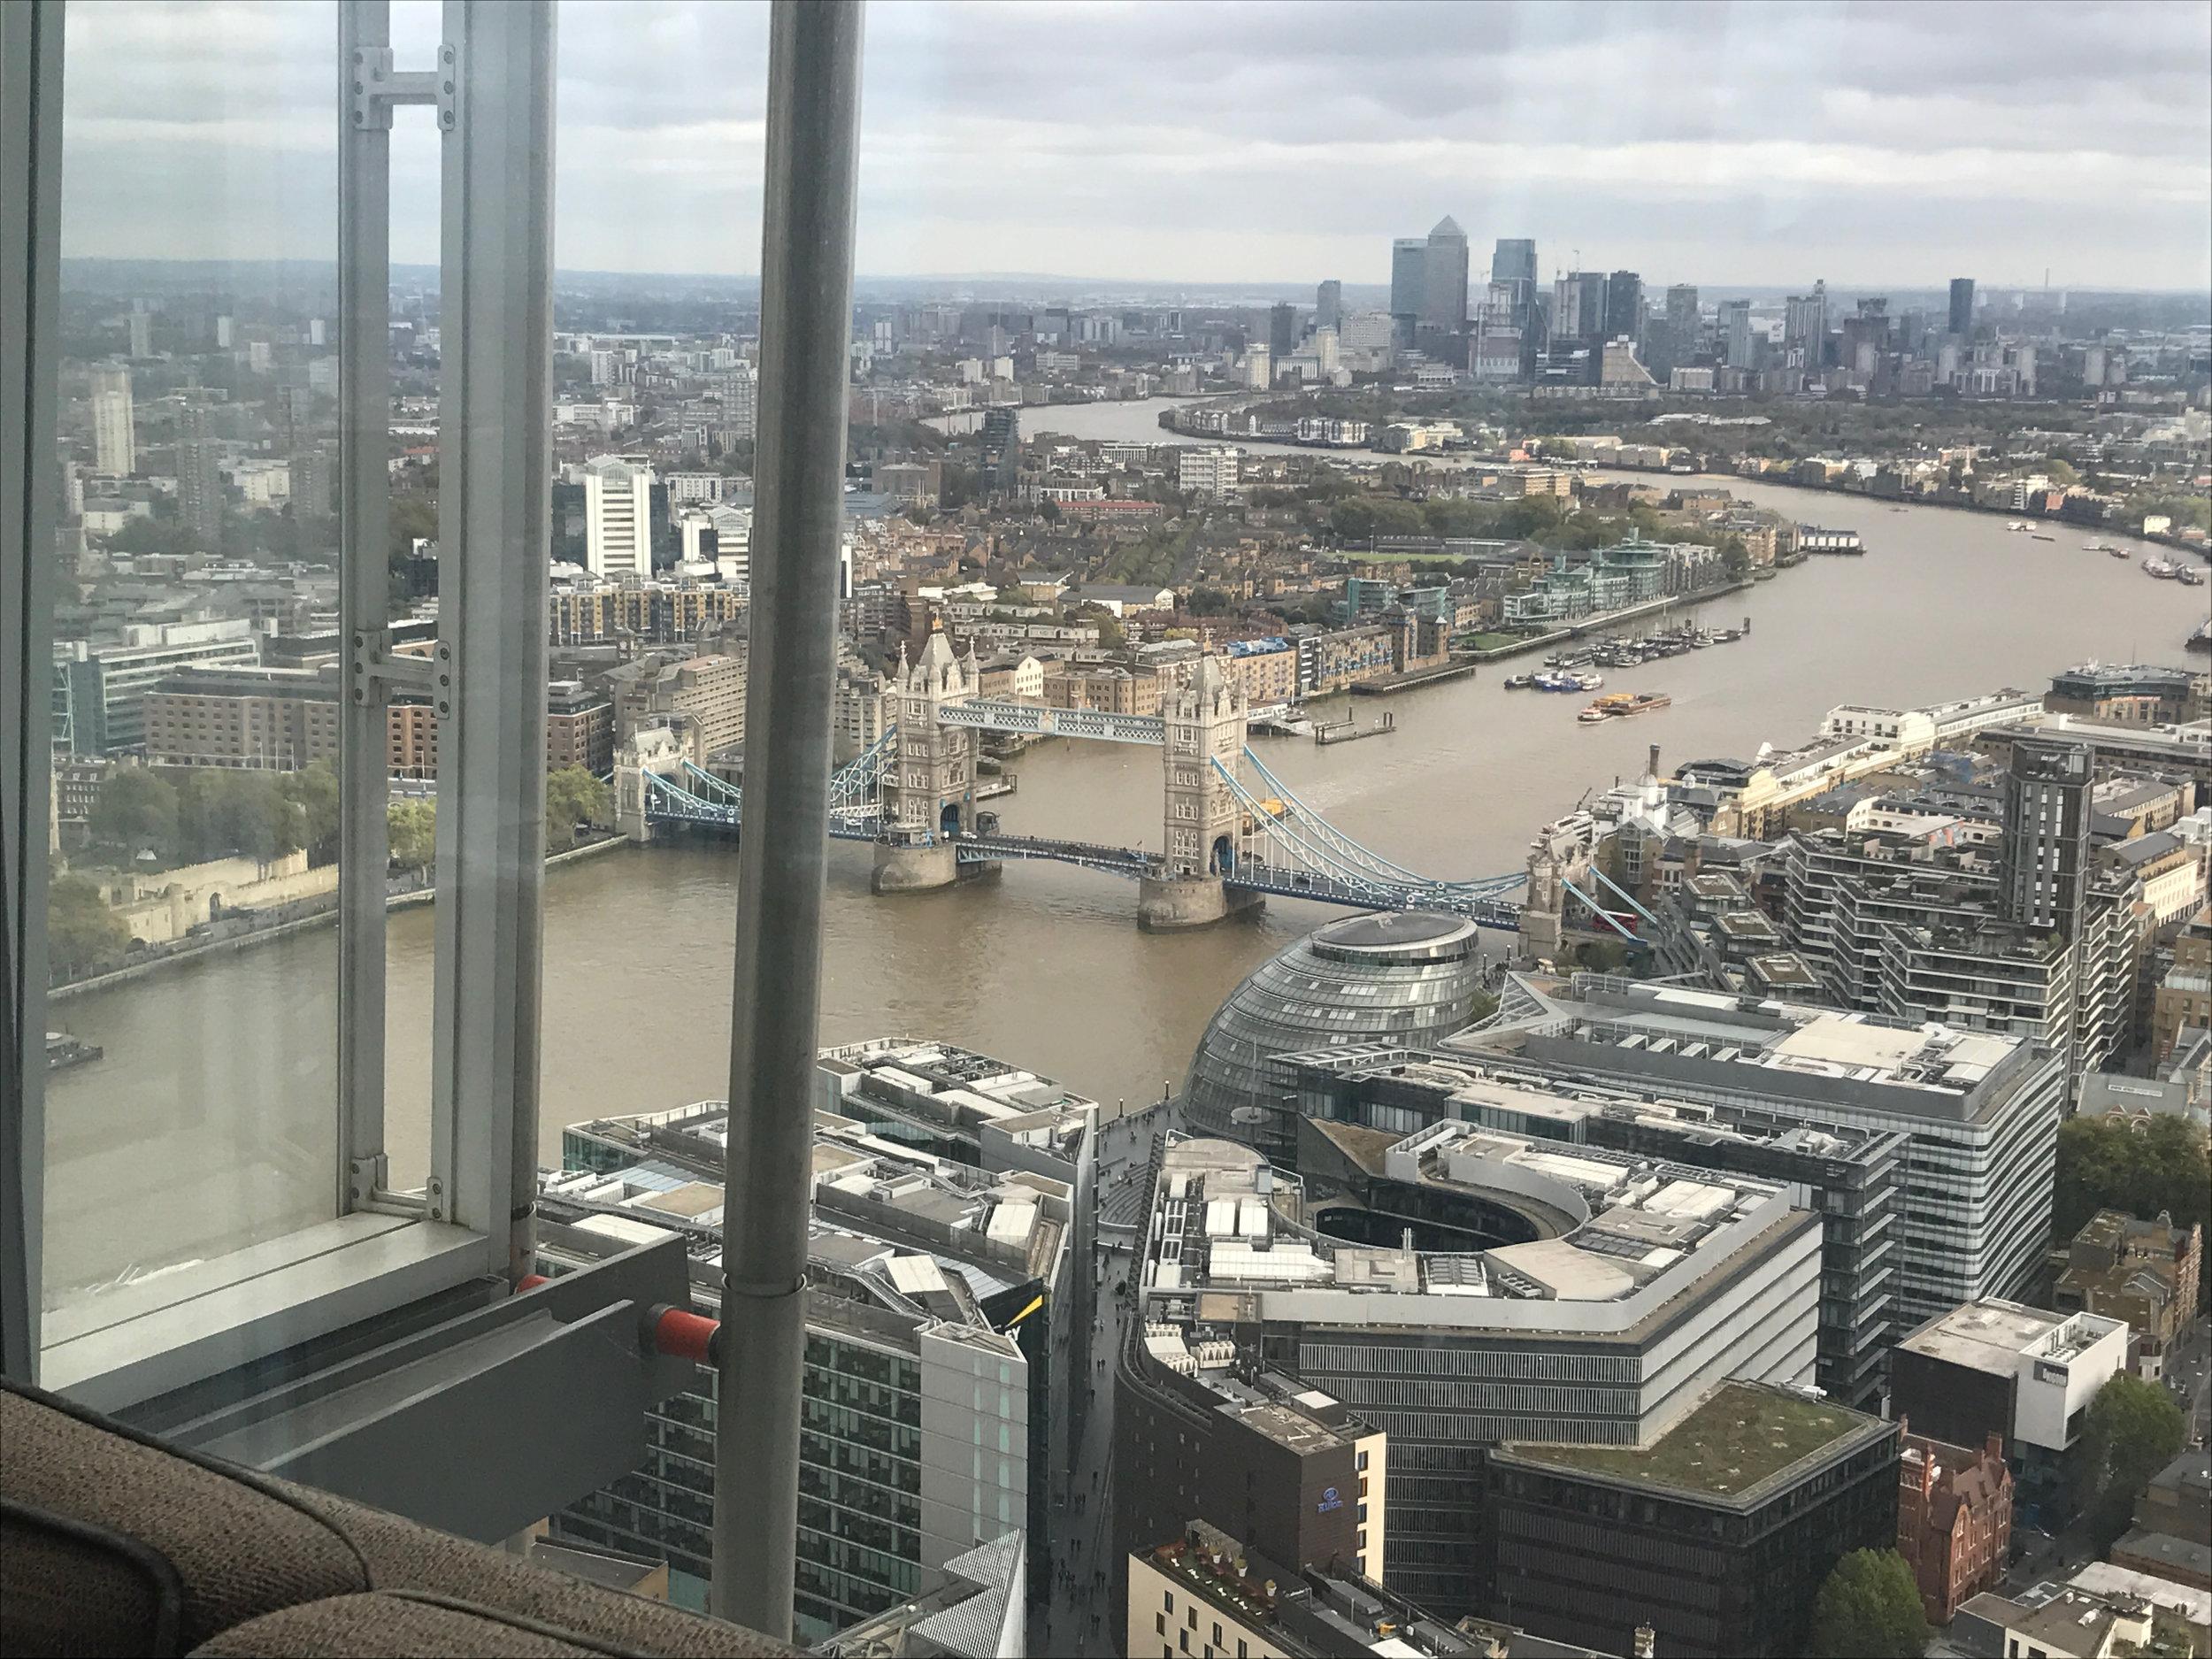 Enjoy the fantastic view from the Shangri-La, Shard, London